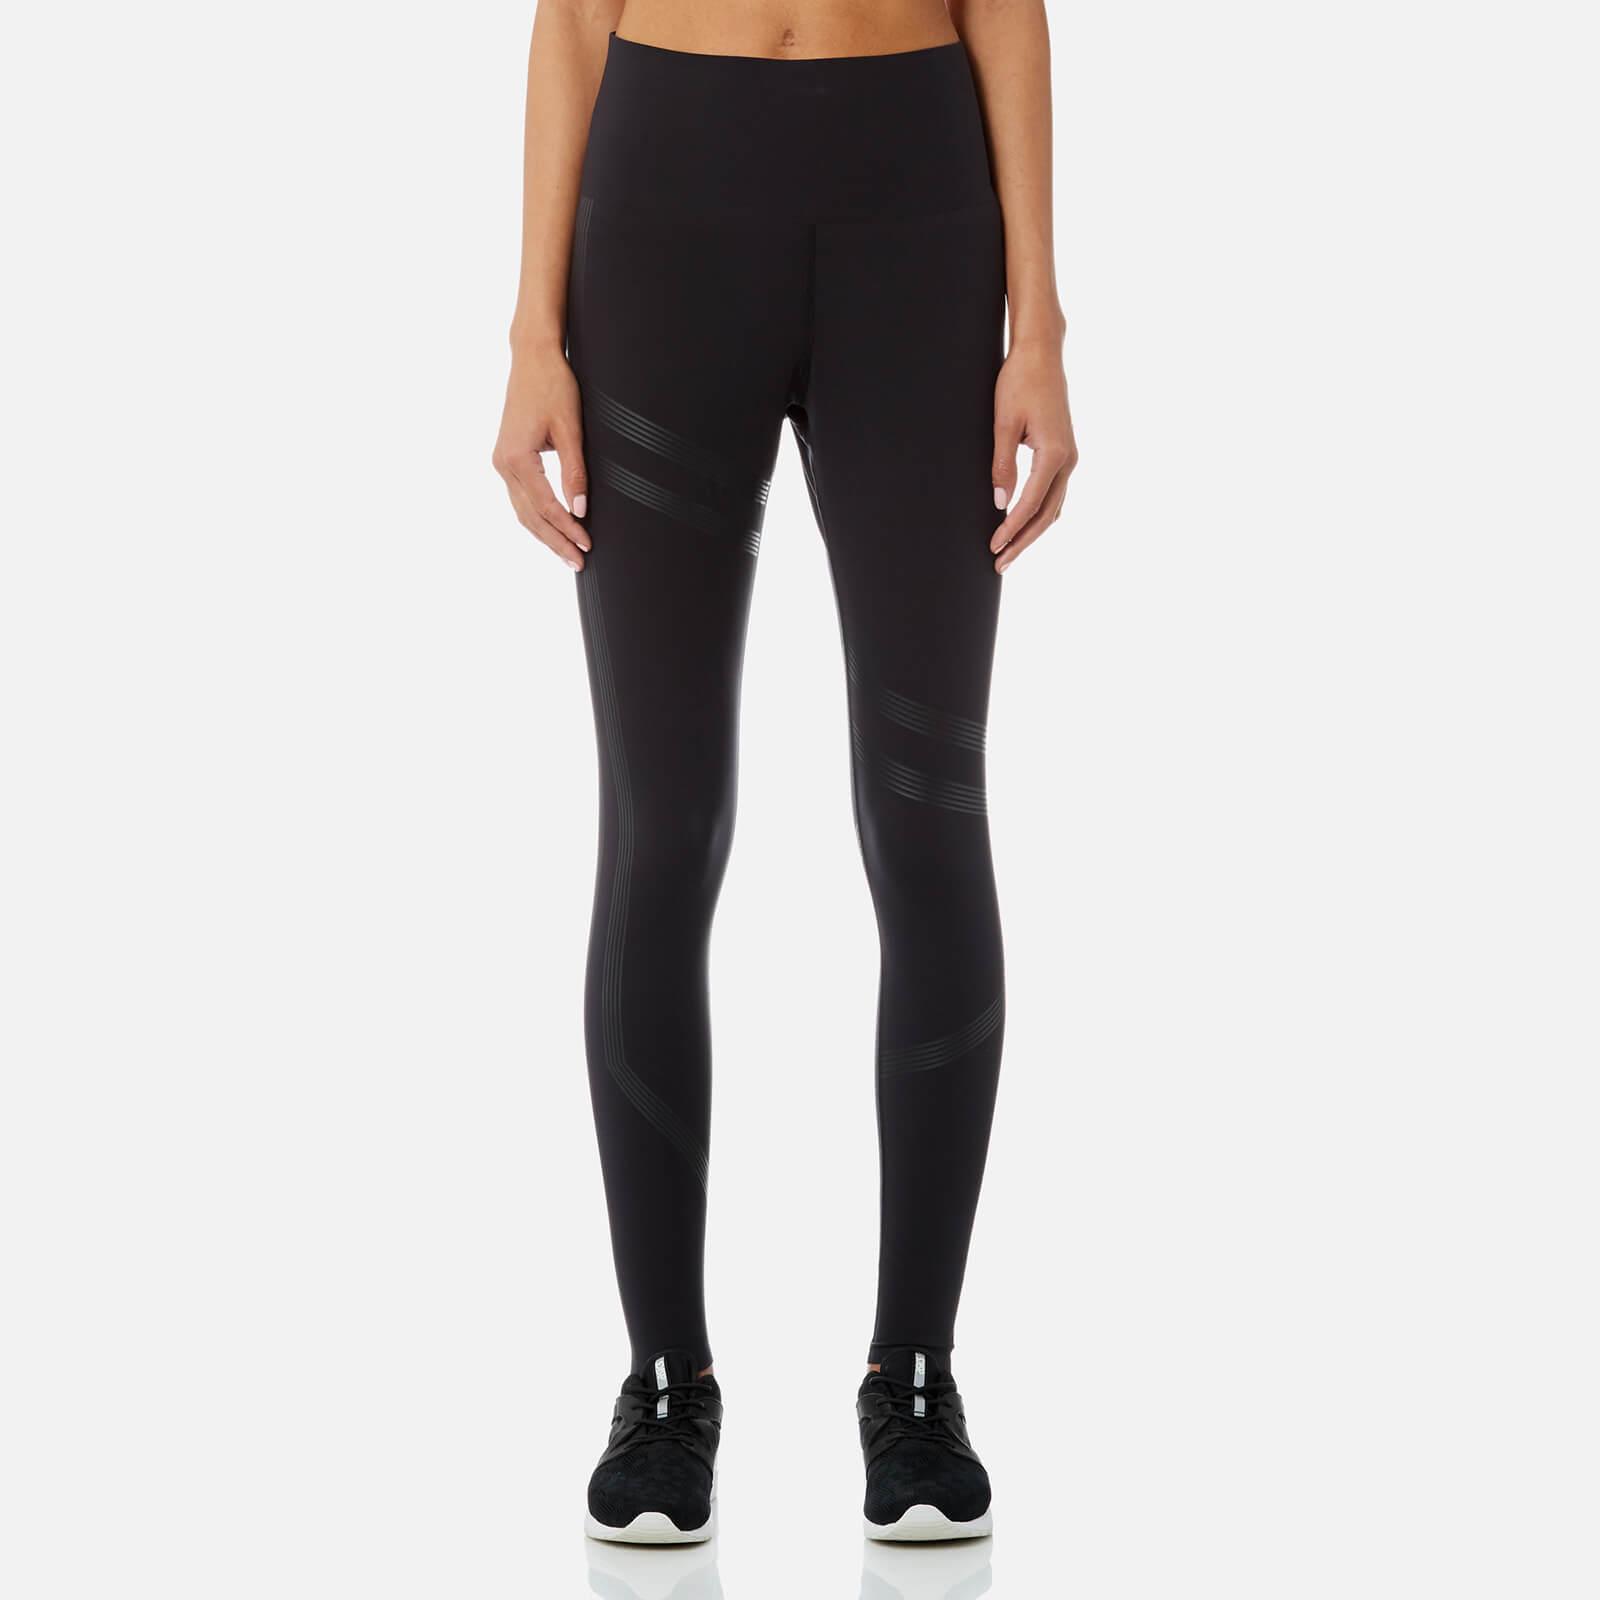 55a77a2ae6f5fc Reebok Women's Linear High Rise Tights - Black Womens Clothing   TheHut.com